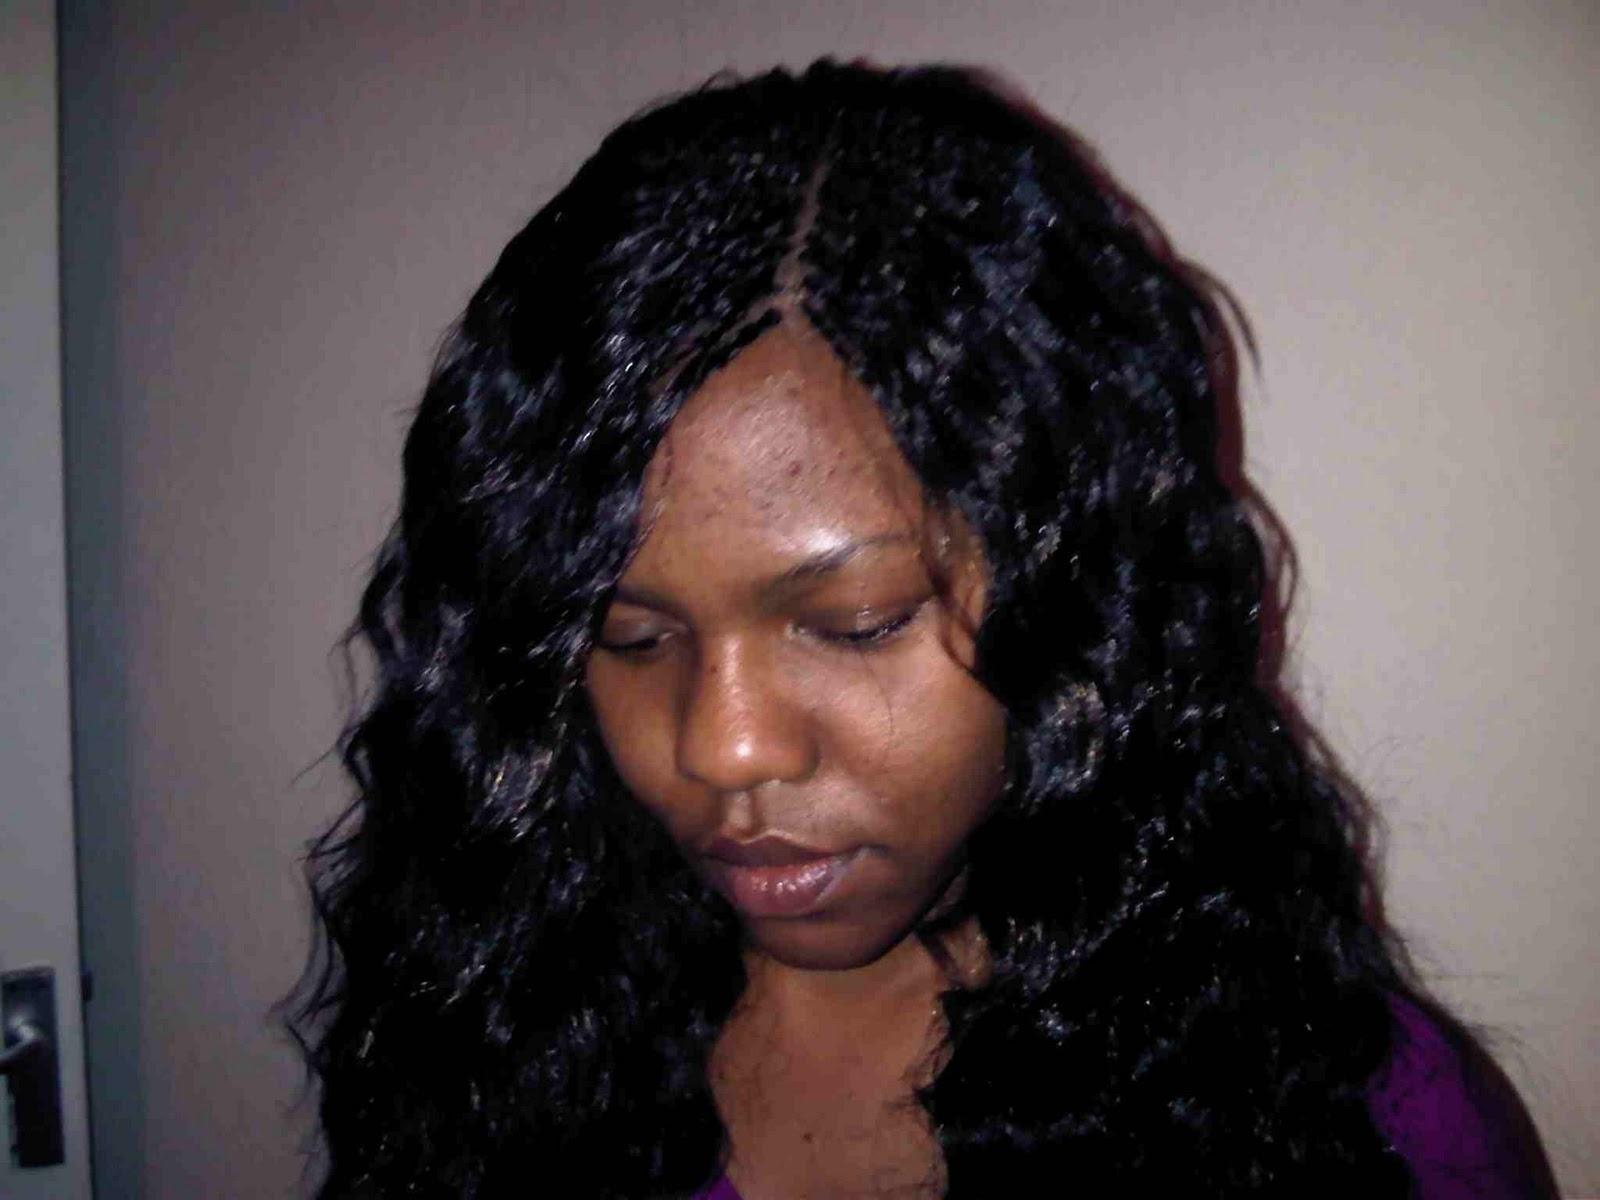 Timeless Beauty;My Lifeline: HAIR GALLERY